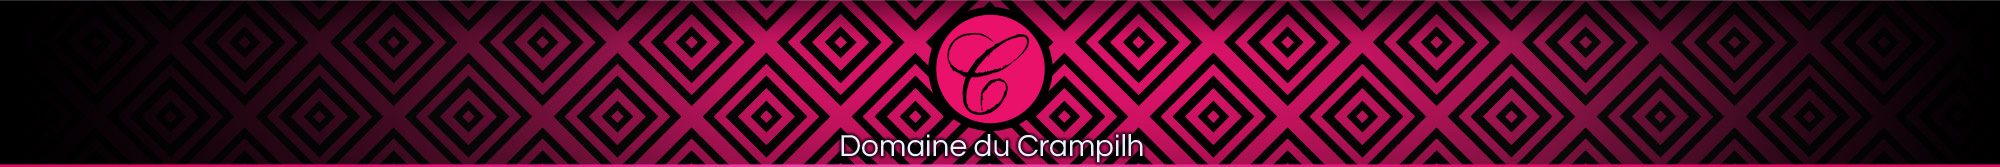 Nous contacter - Domaine du Crampilh